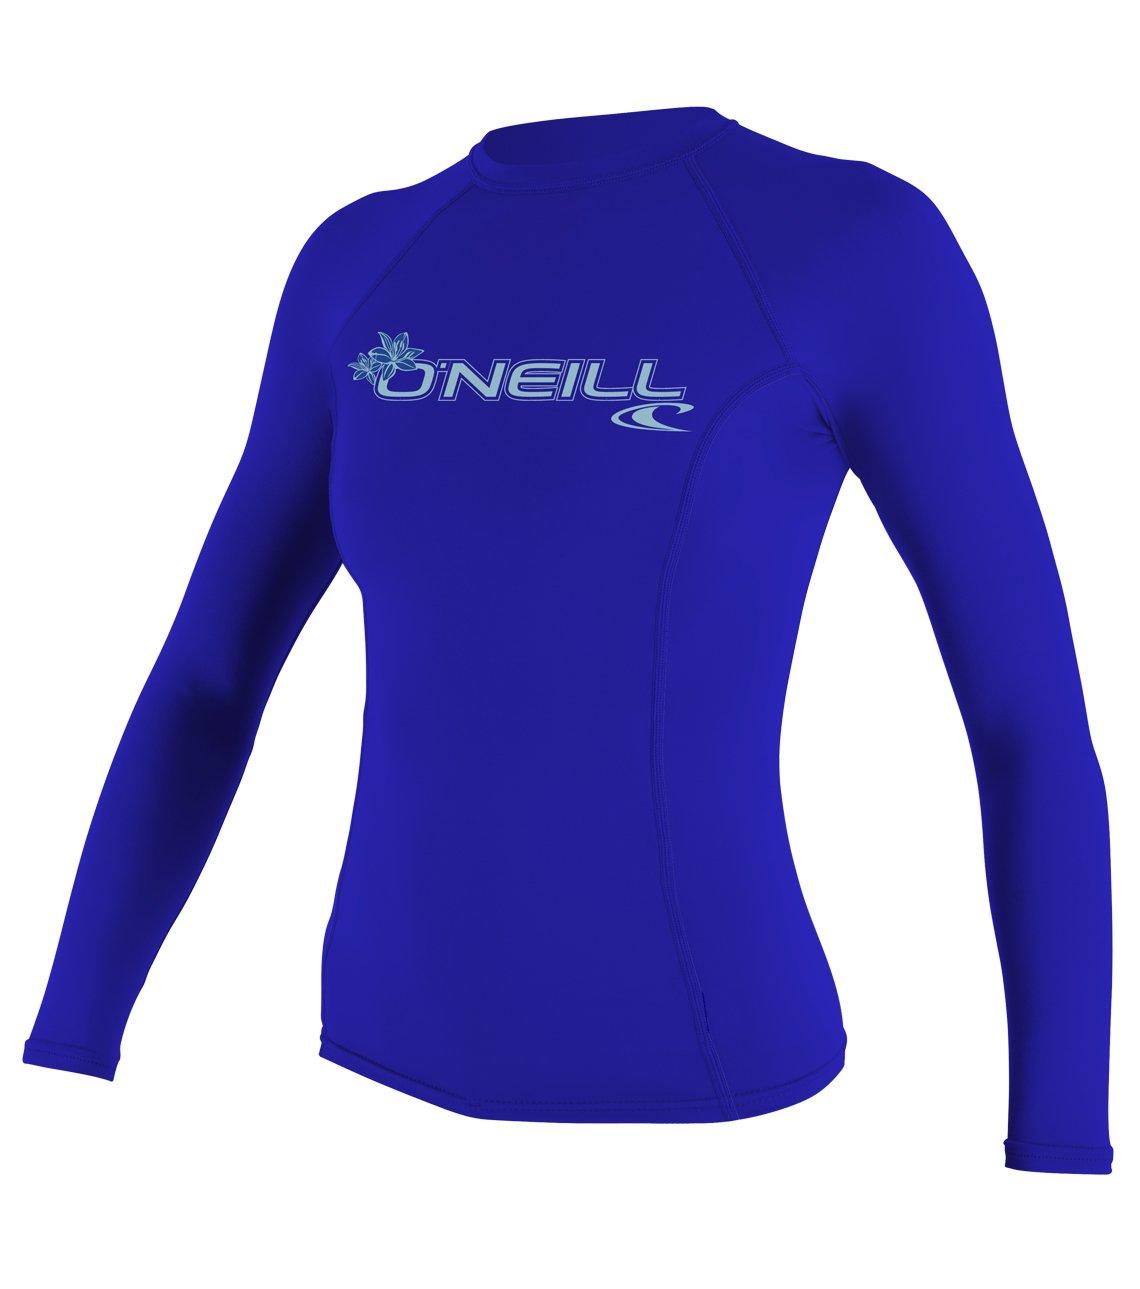 O'Neill  UV Sun Protection Womens Basic Skins Long Sleeve Crew Sun Shirt Rash Guard, Tahitian Blue, X-Small